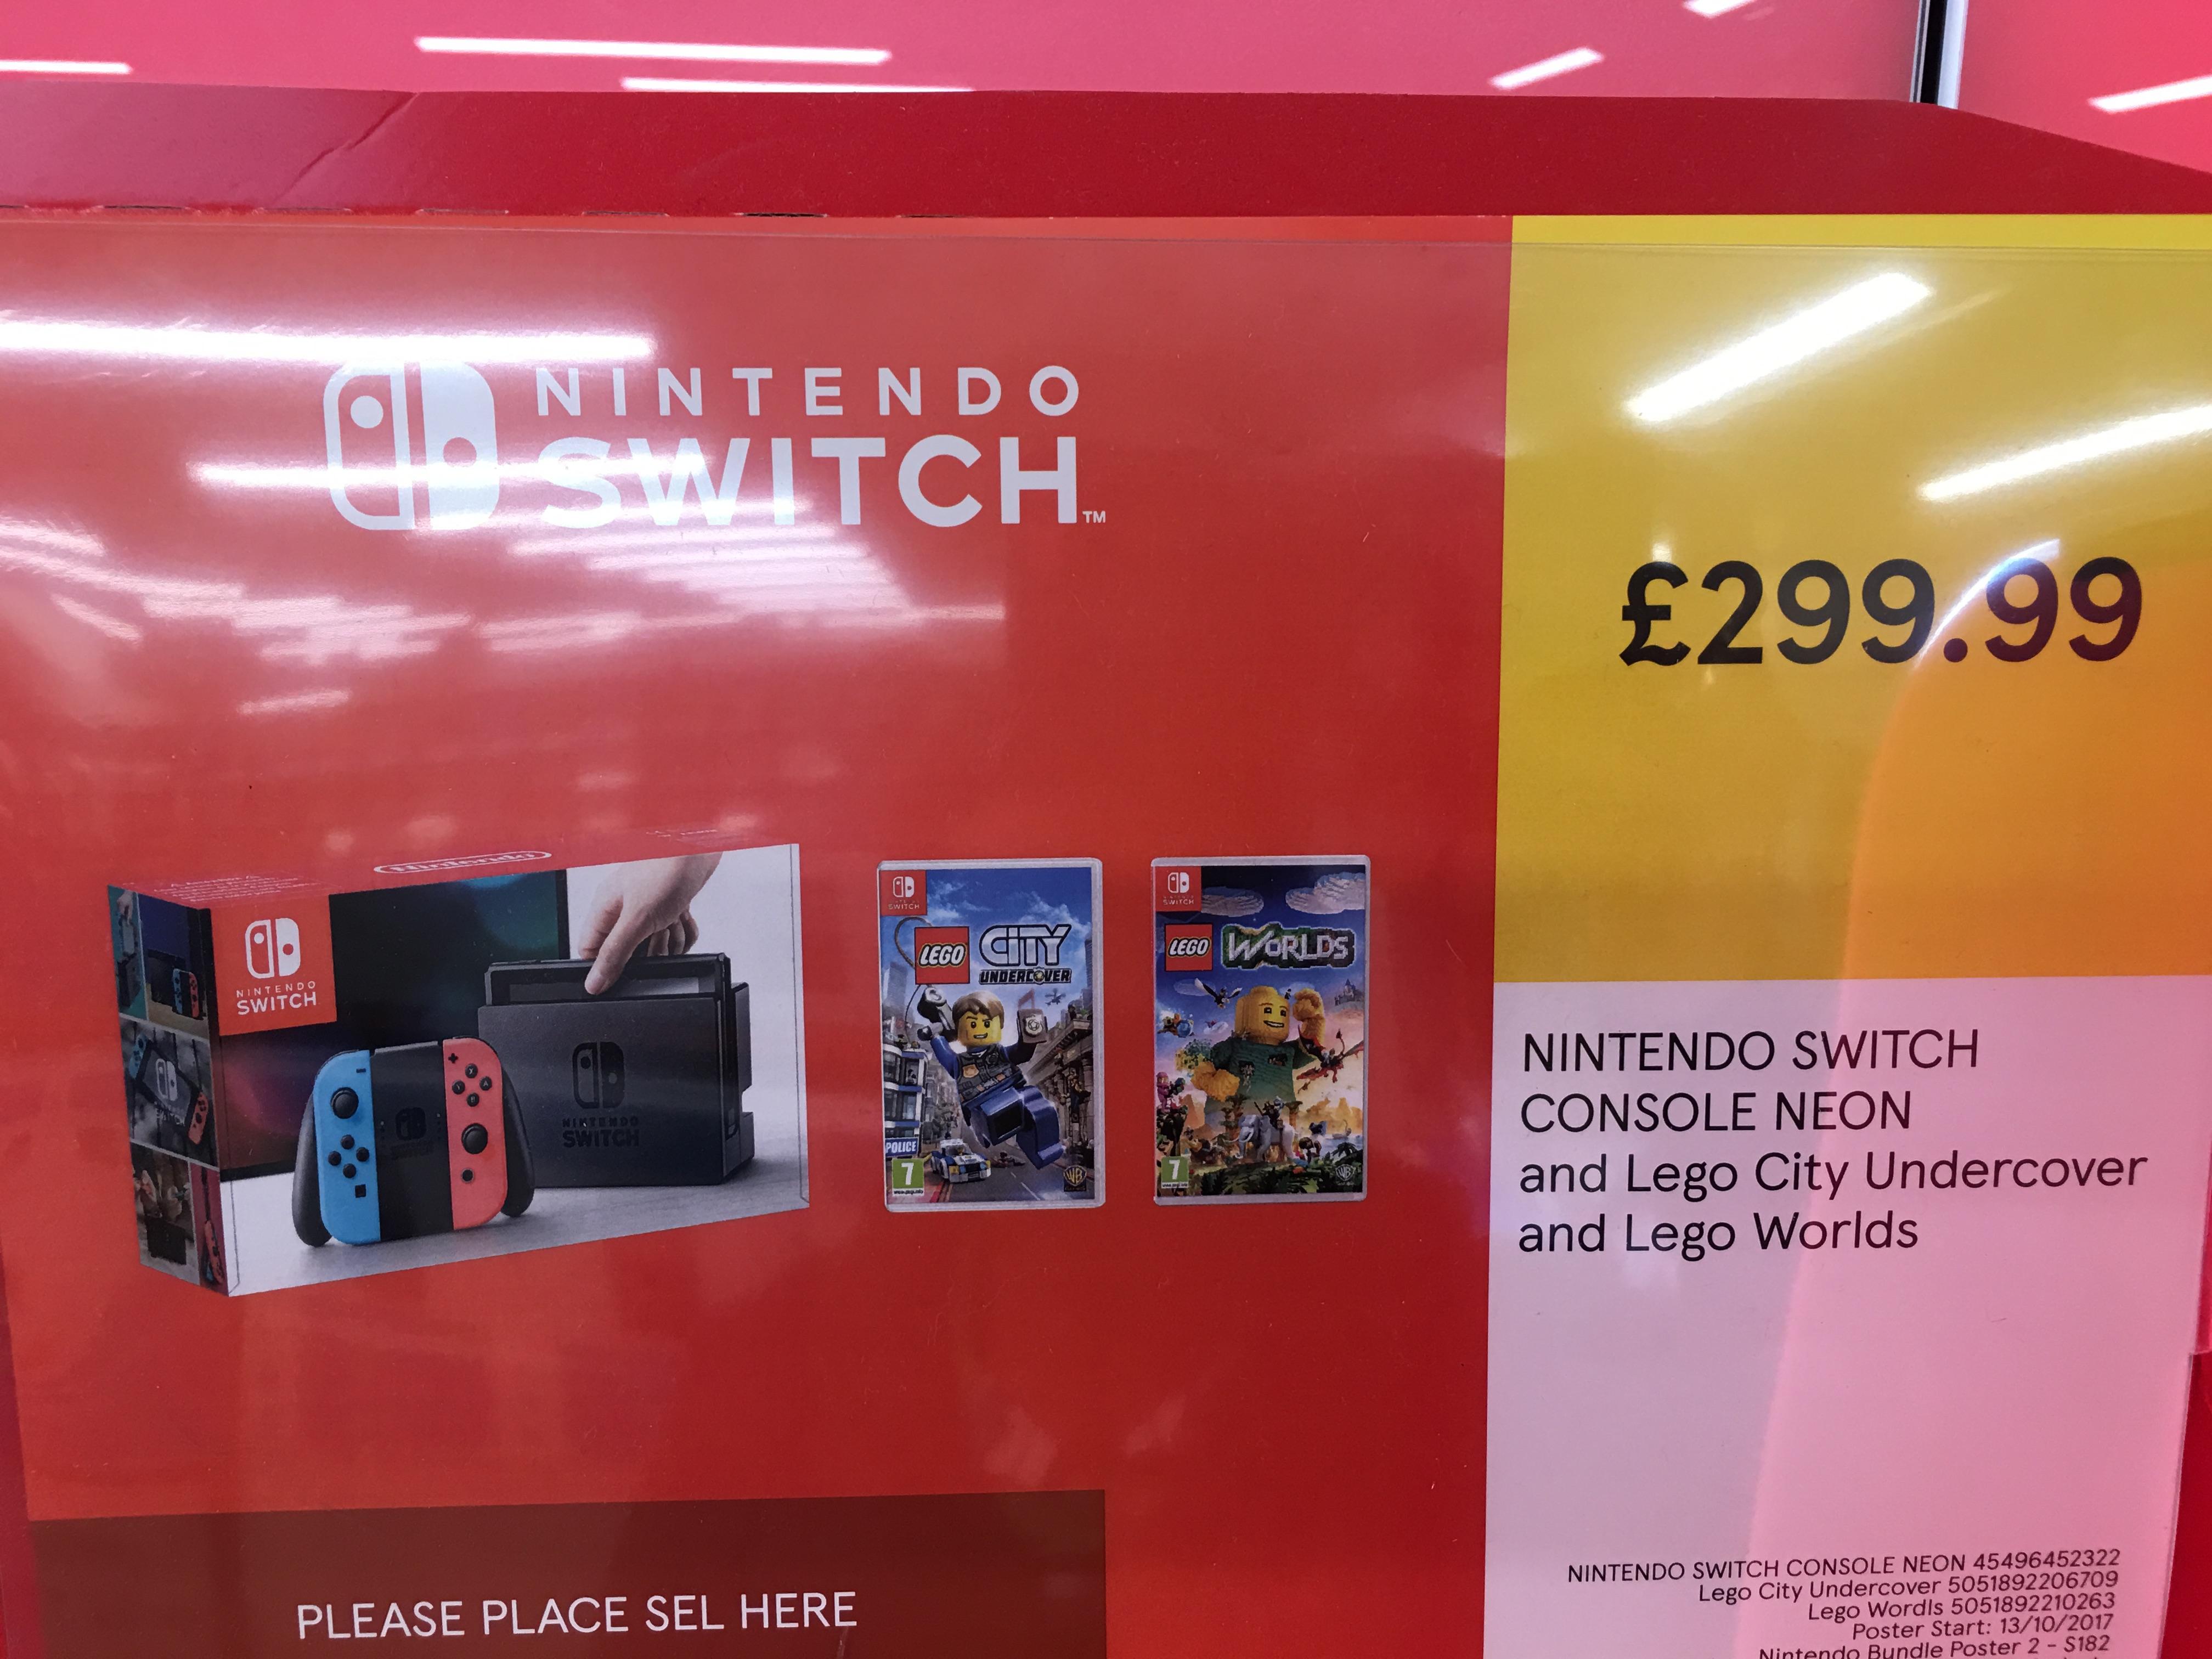 Nintendo Switch Neon / Blue Console + Lego City Undercover + Lego Worlds £299.99 @ Tesco